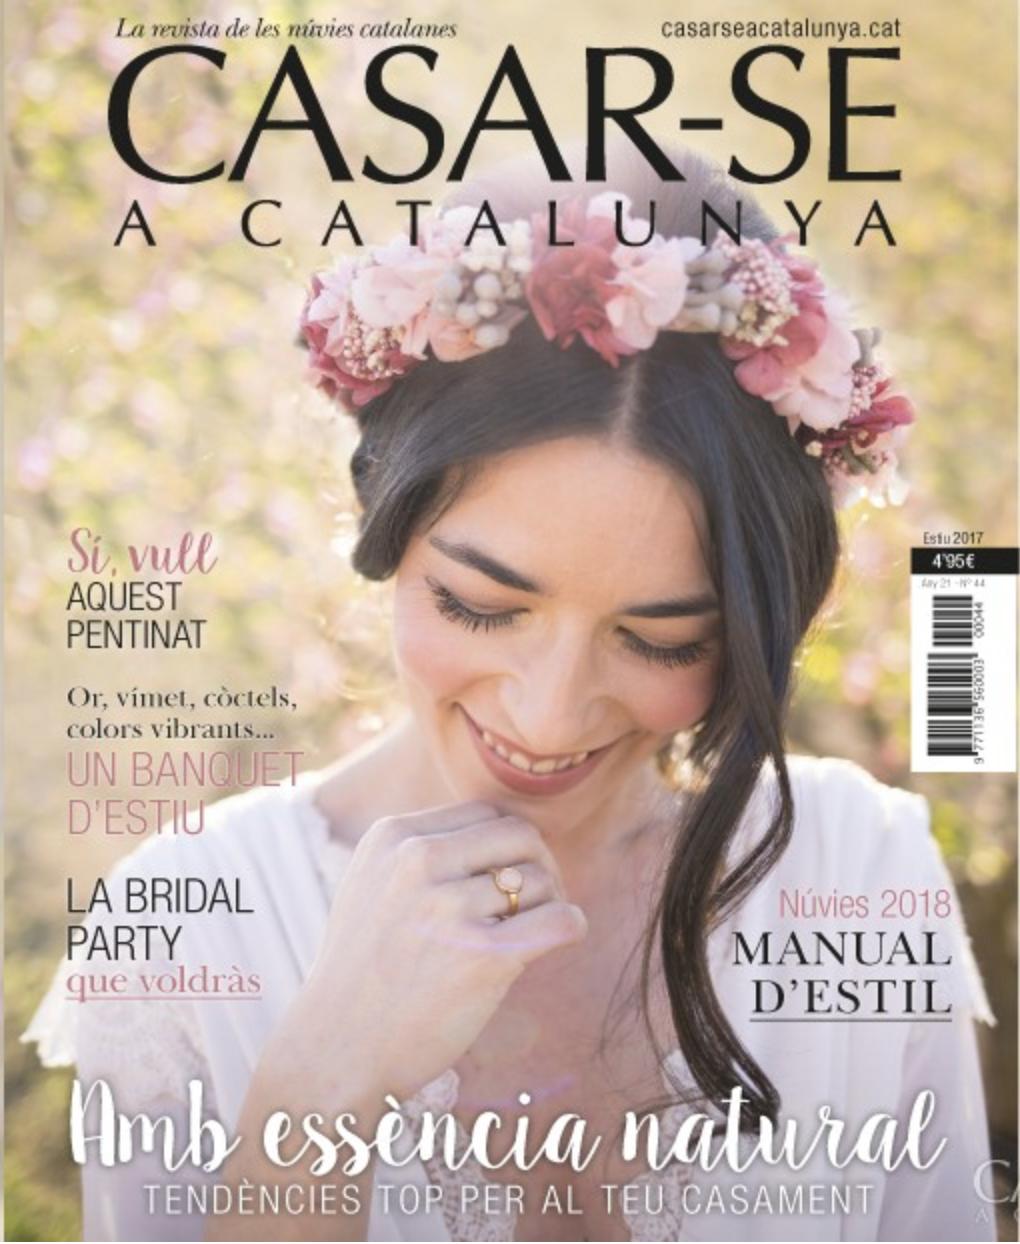 Casarse a Cataluna - Shooting de portada